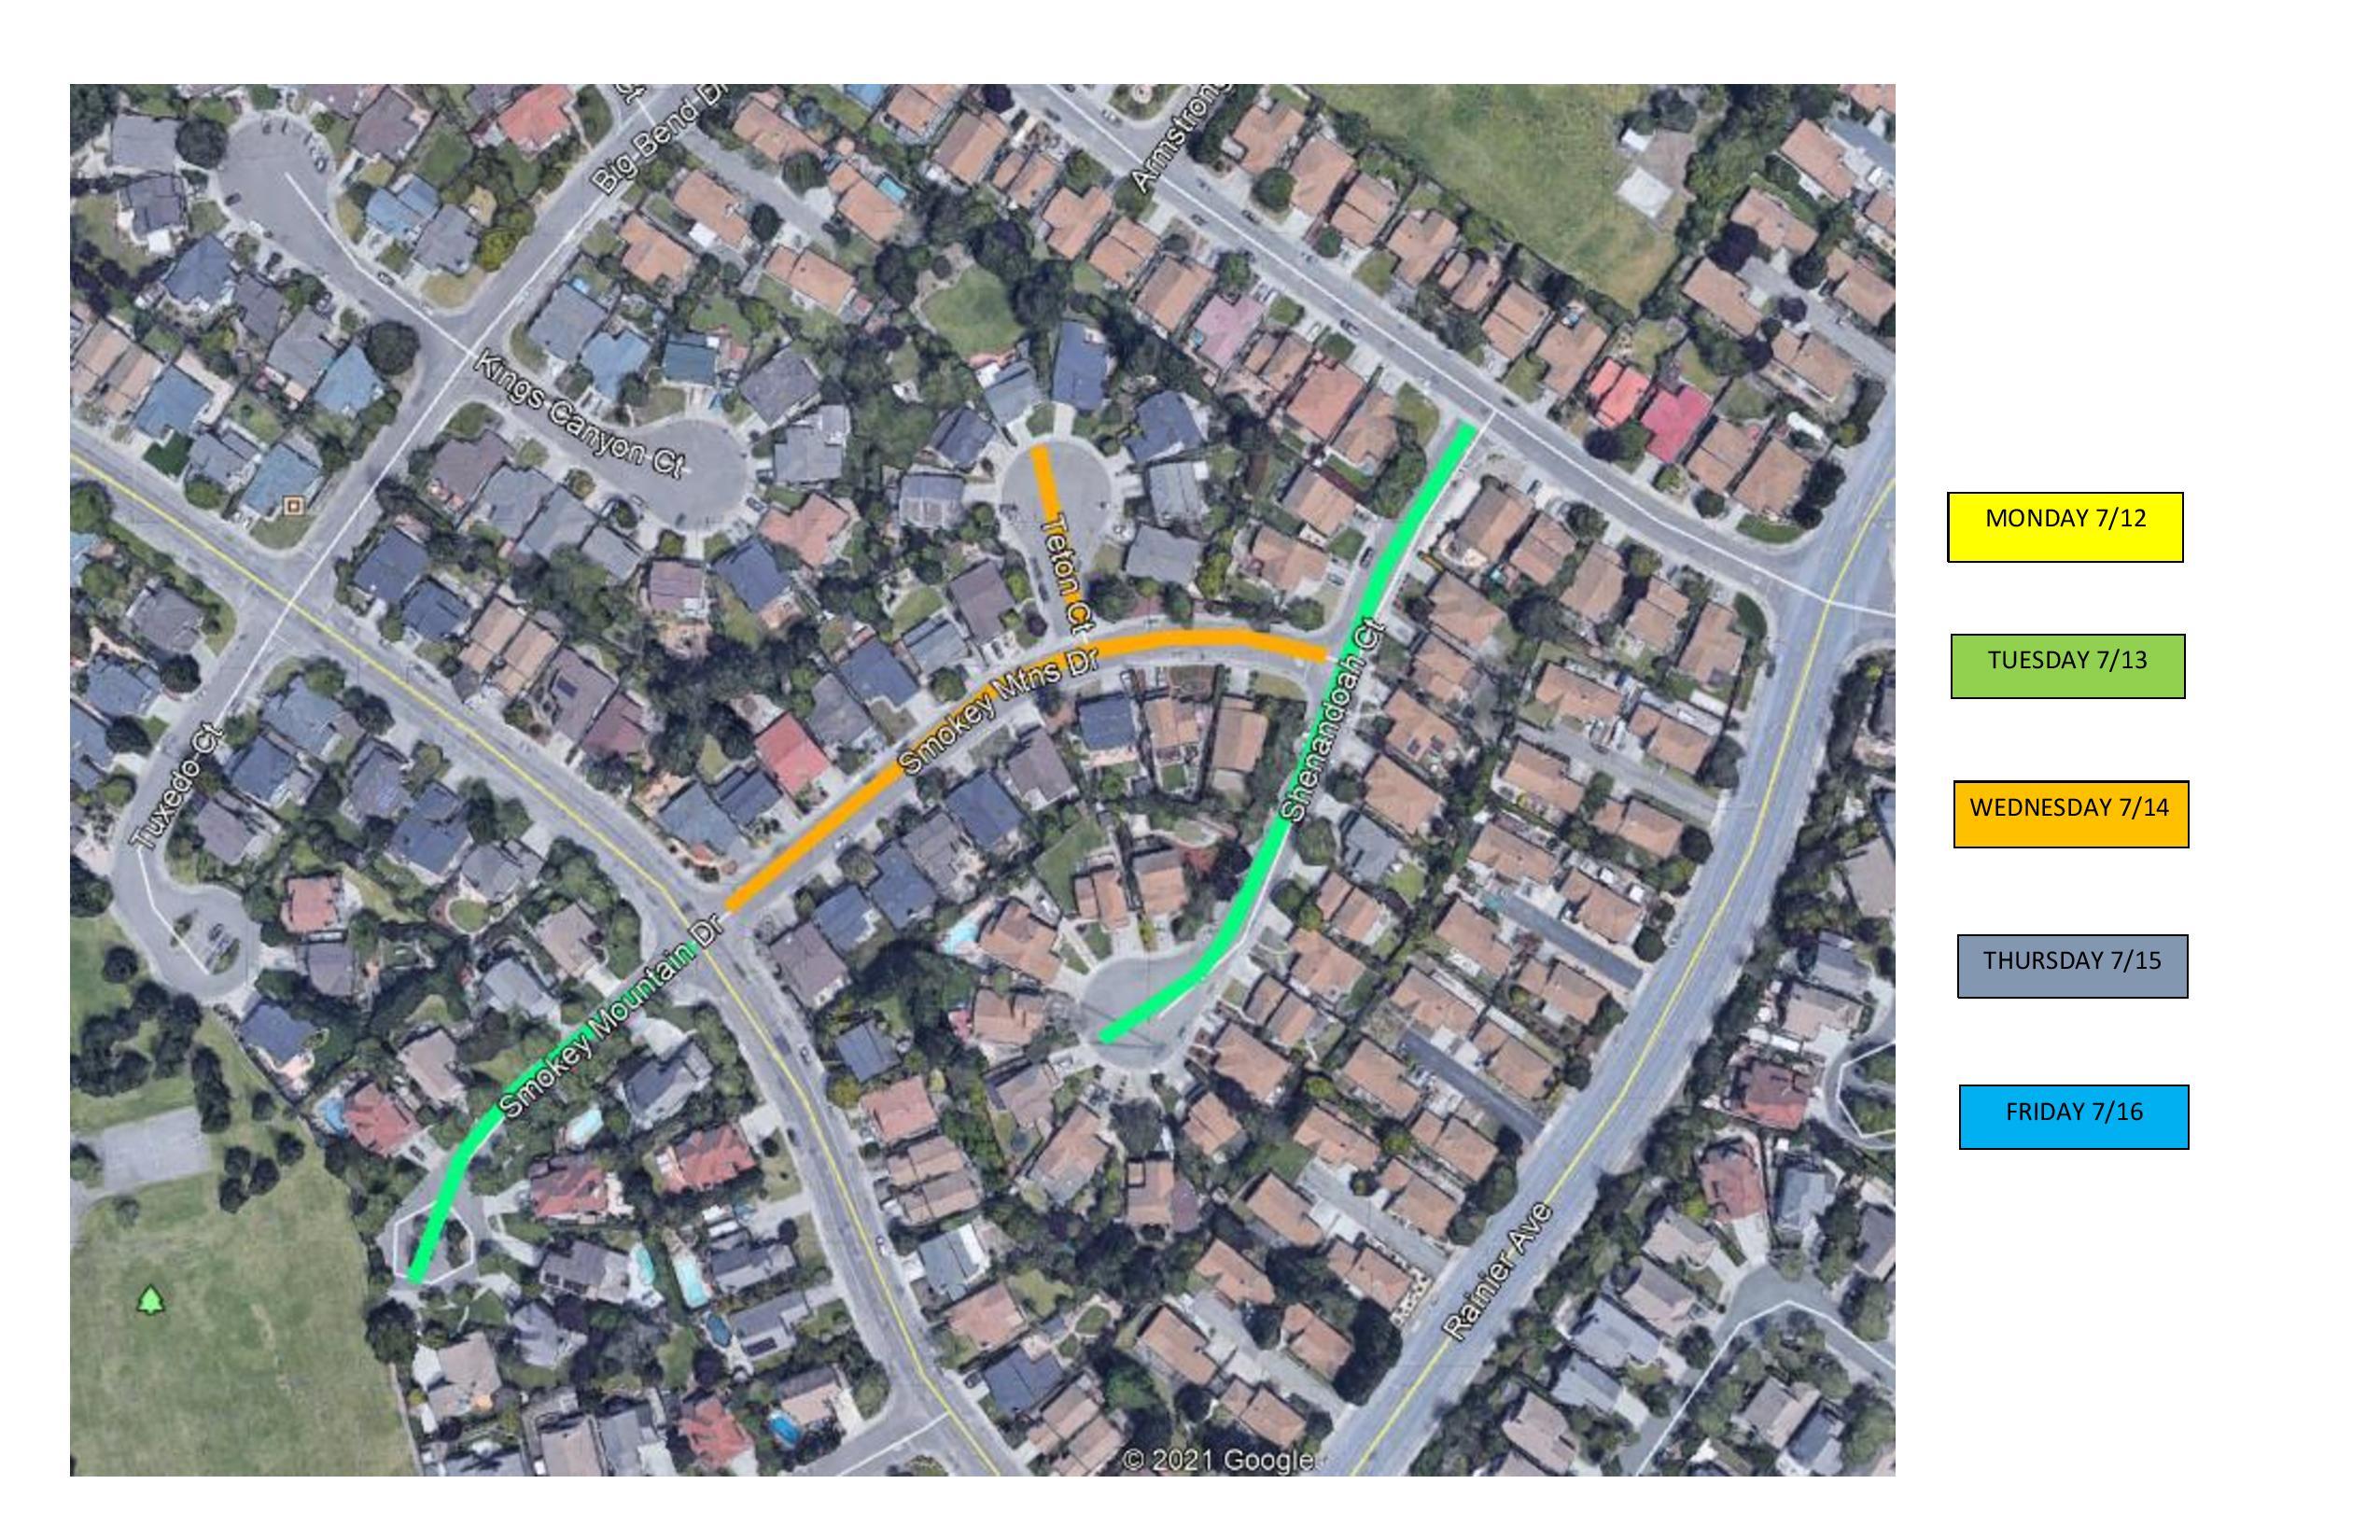 Pavement Map 3 7_12 thru 7_16